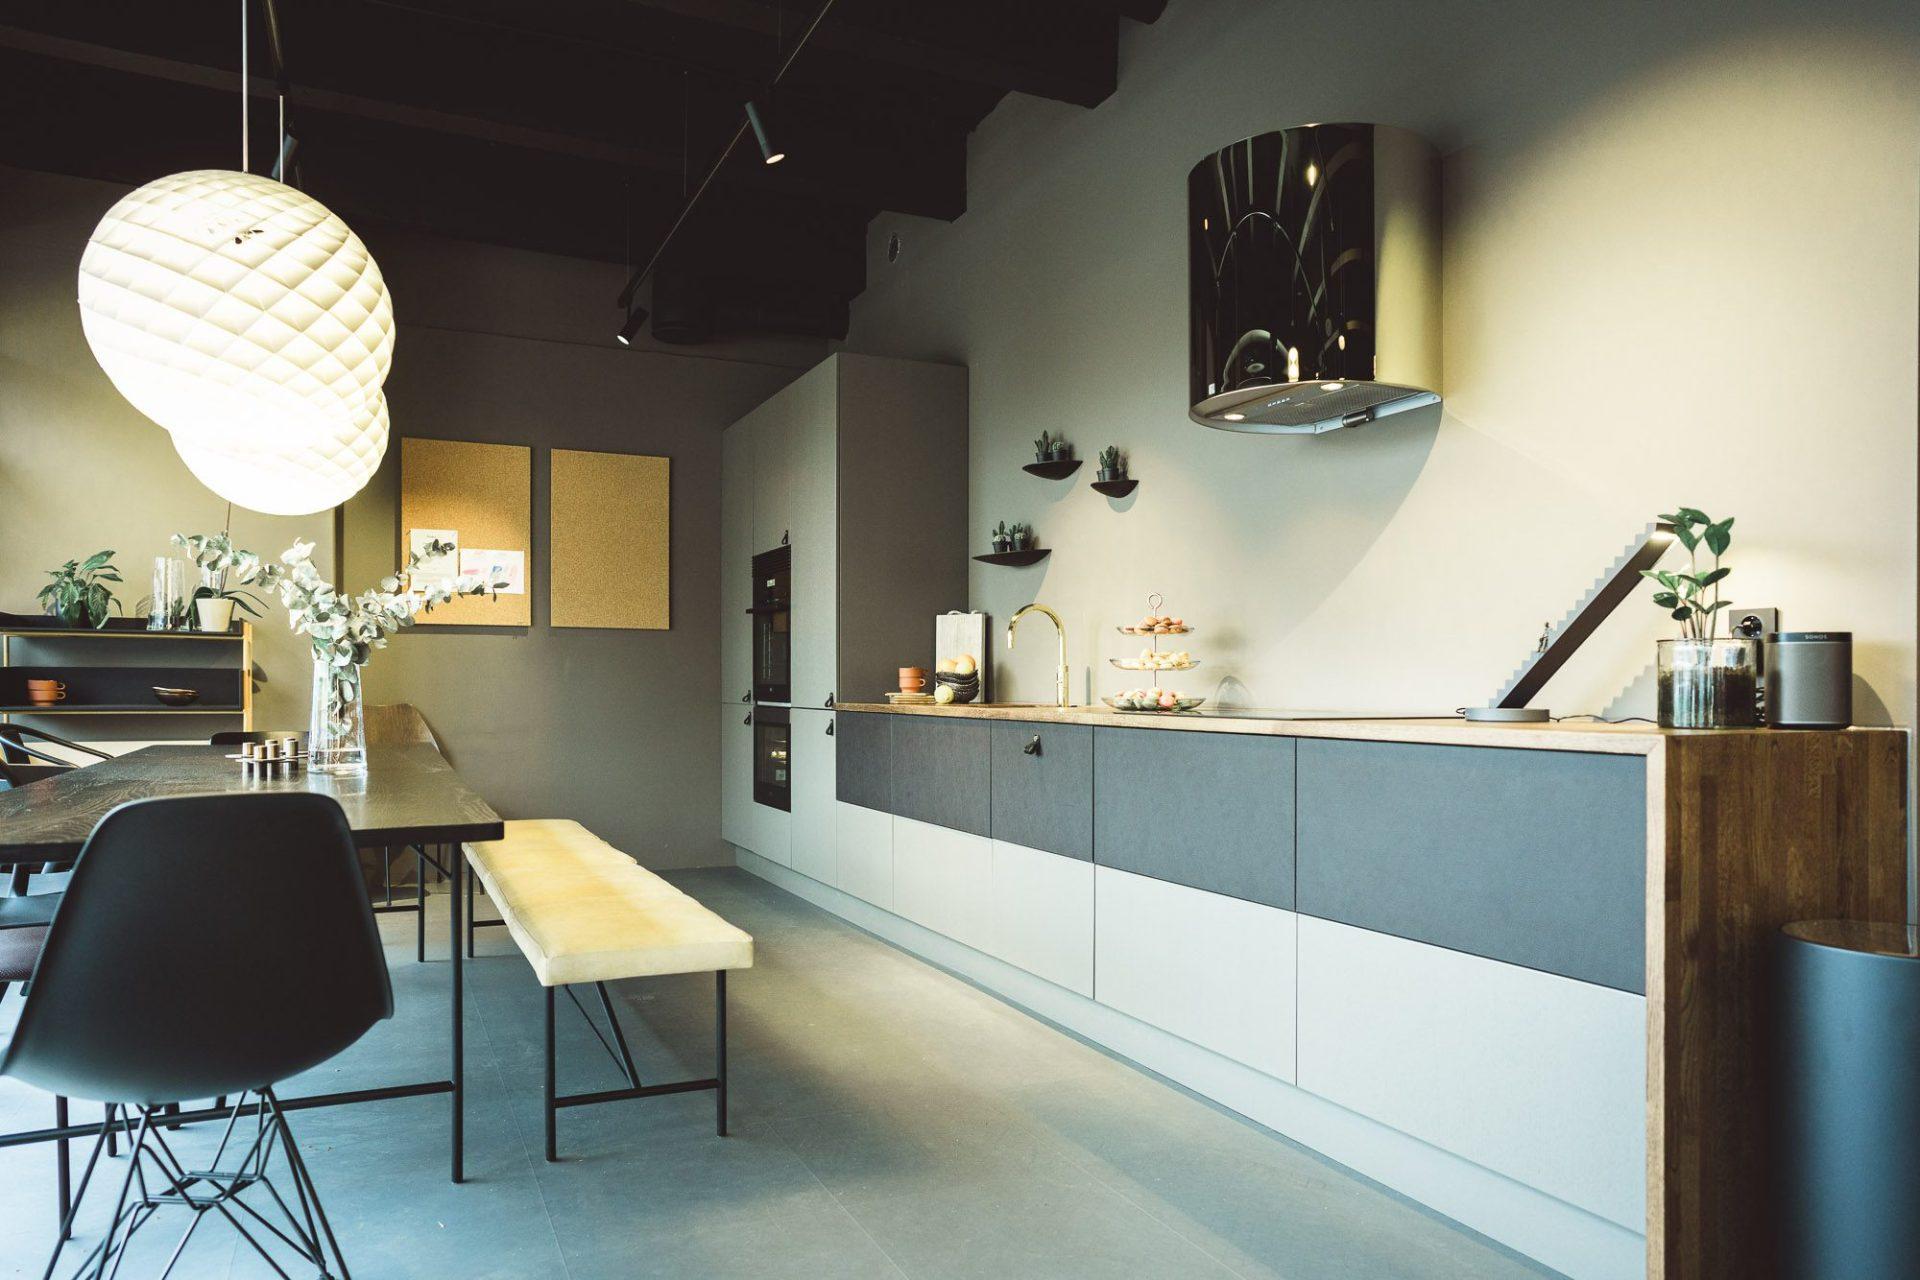 Hollendaren - Nova interiør